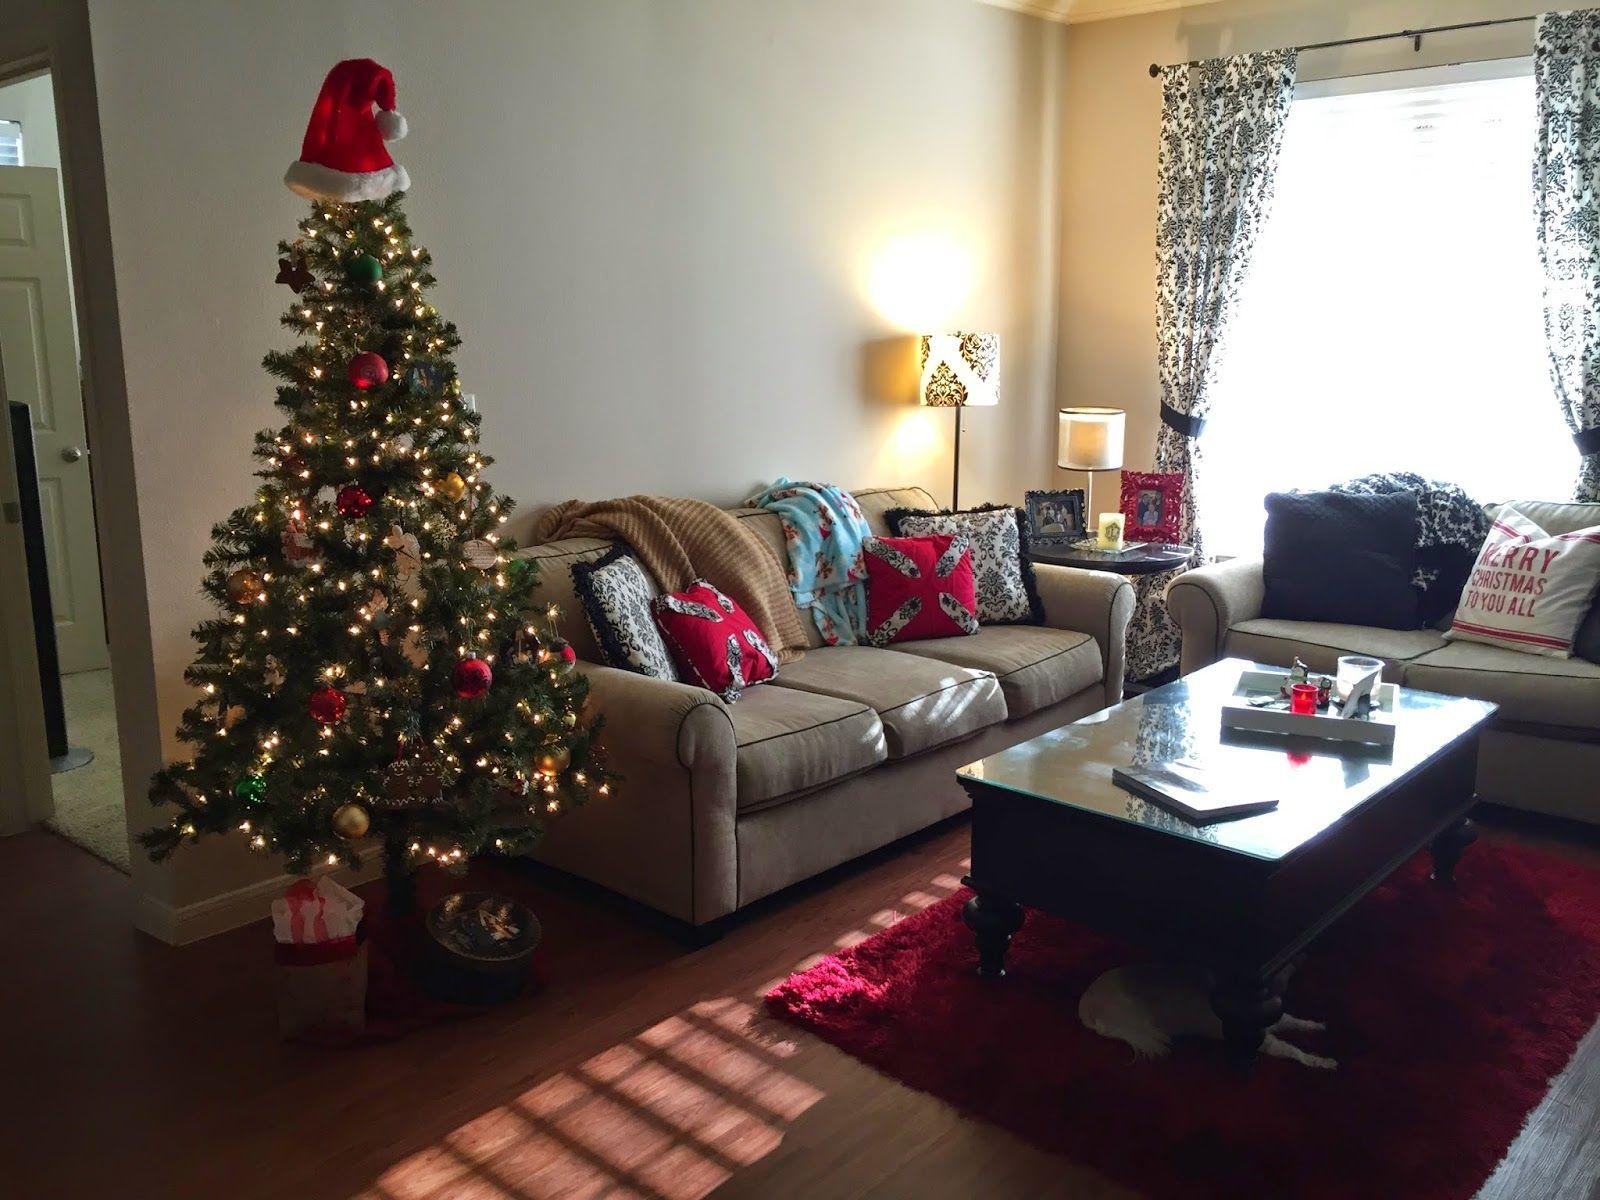 Oh Christmas Tree! I love thee!